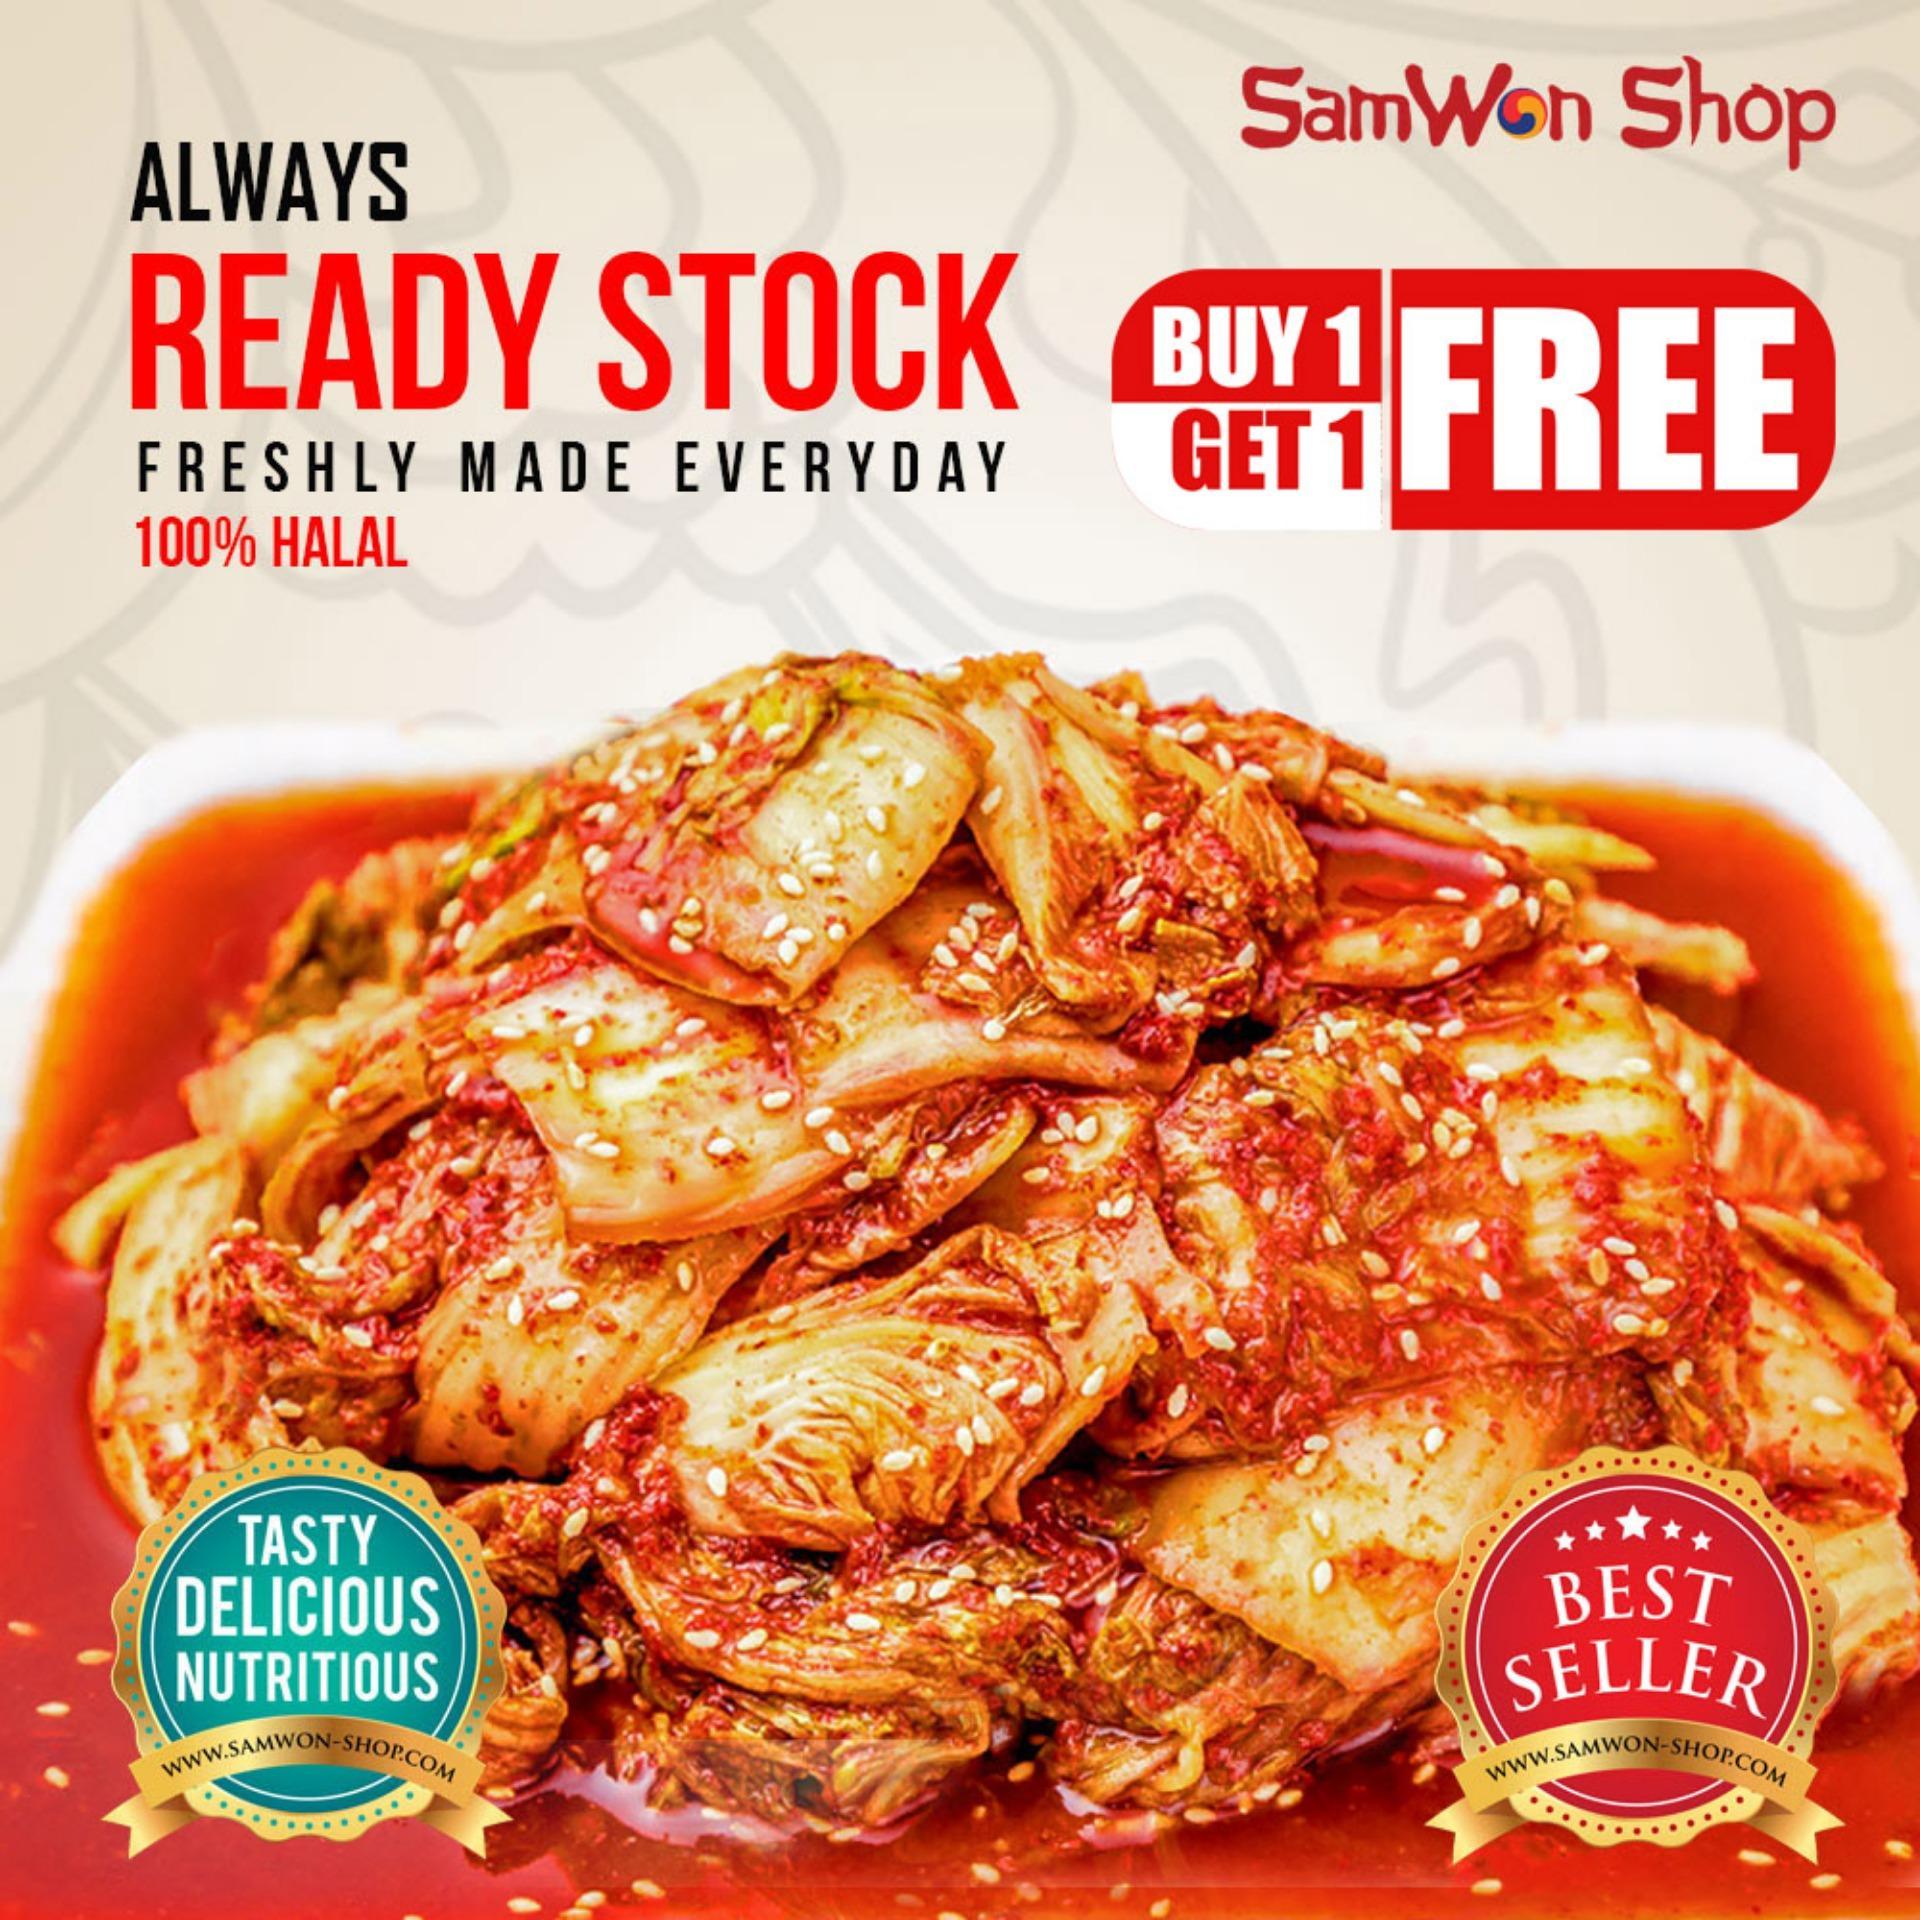 Kimchi Sawi Fresh - 1 Kg Makanan Korea Enak Bergizi Promo Buy 1 Get 1